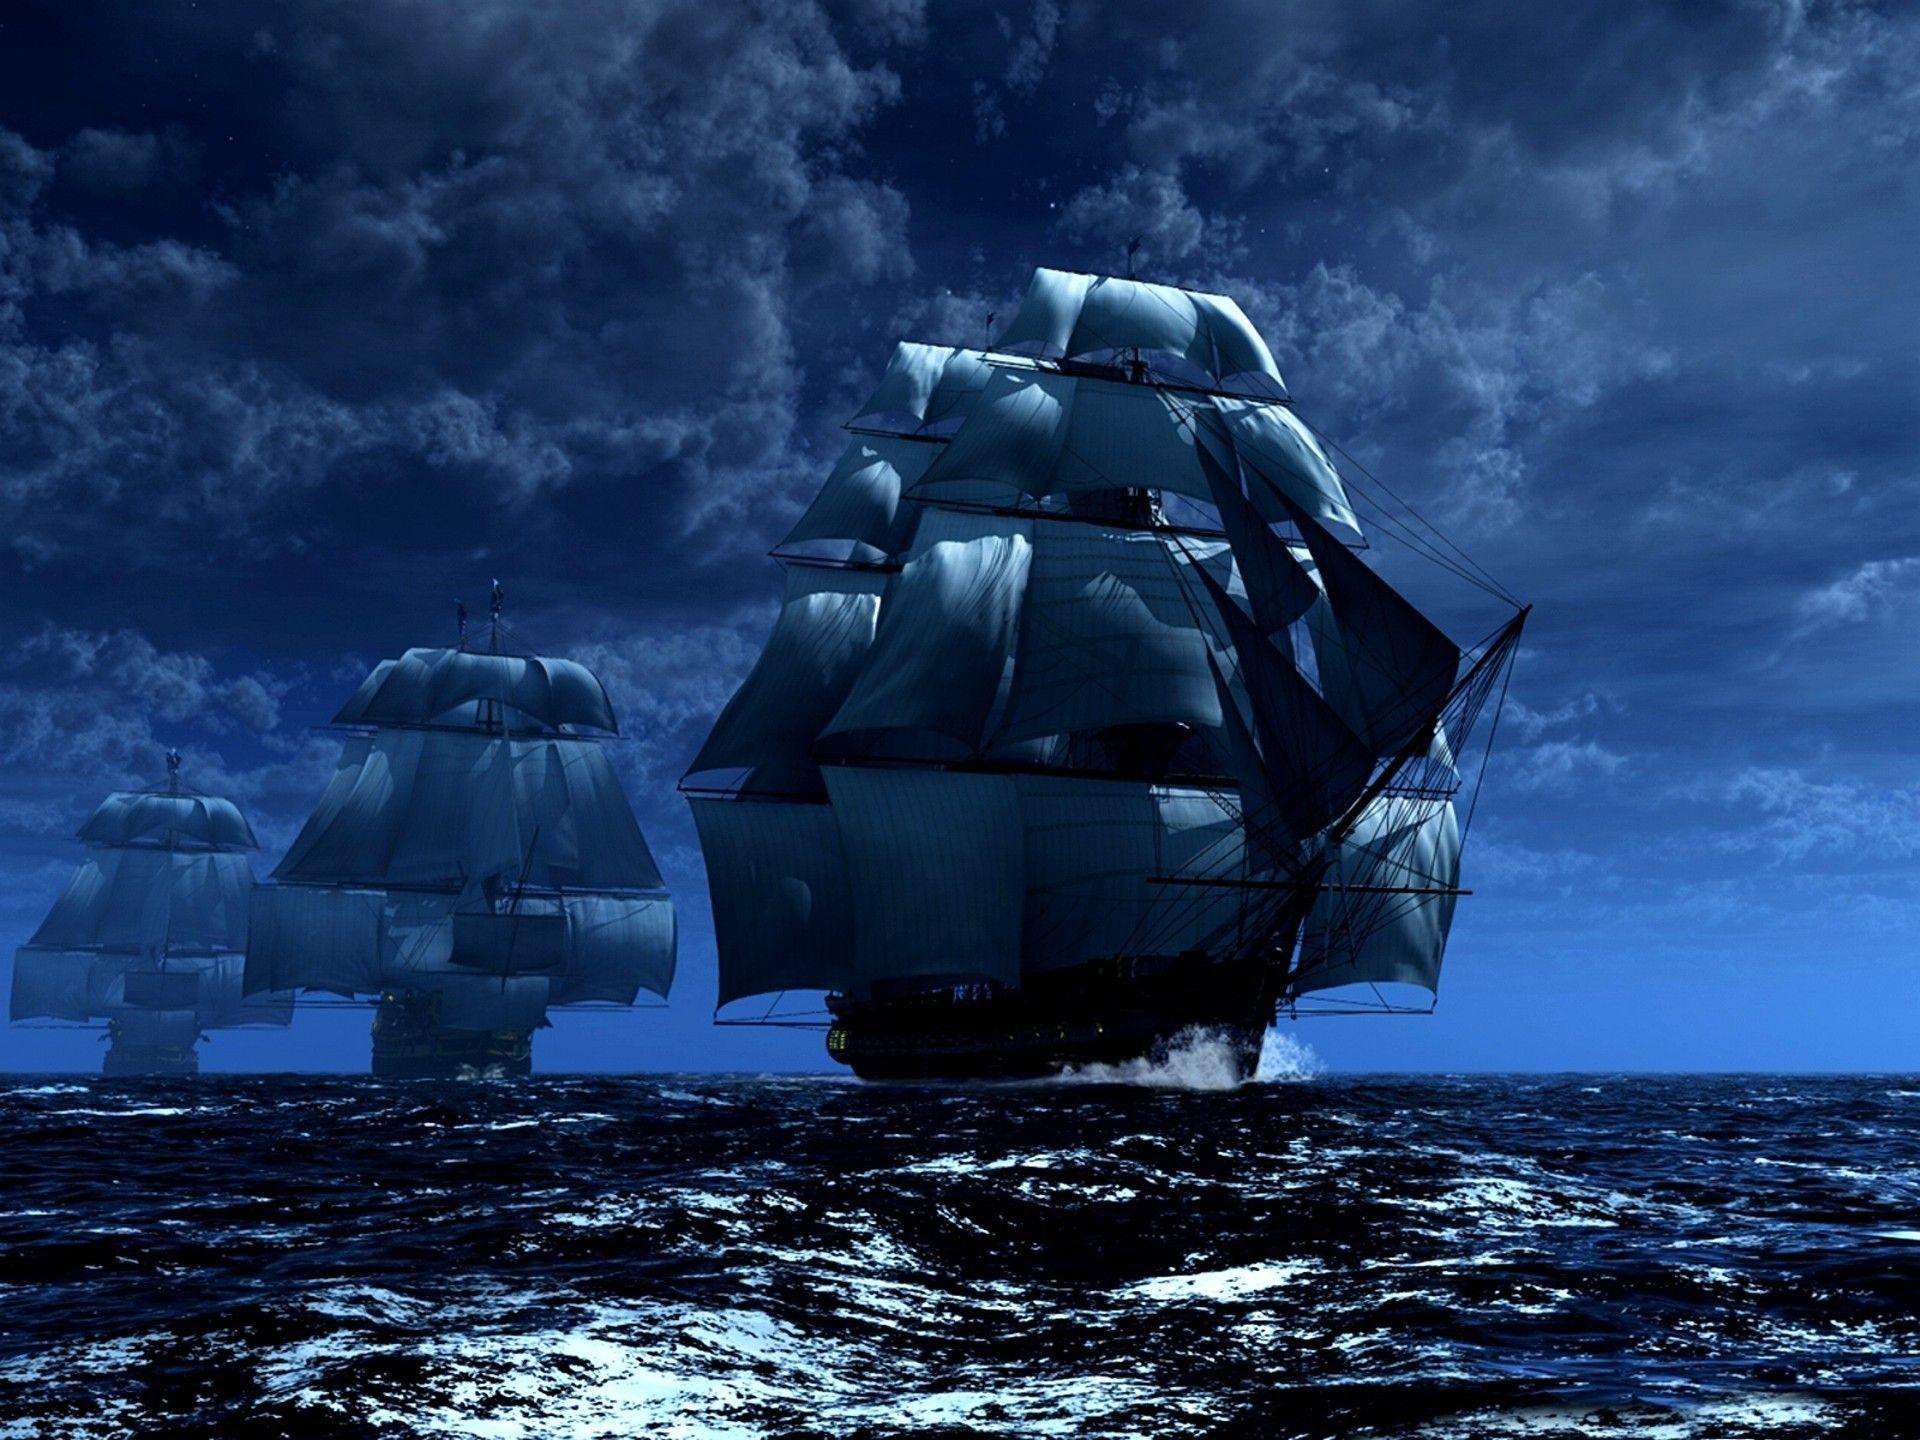 ships_vehicles_water_best_widescreen_background_awesome_desktop_1920x1440_hd-wallpaper-1303315.jpg (1920×1440)